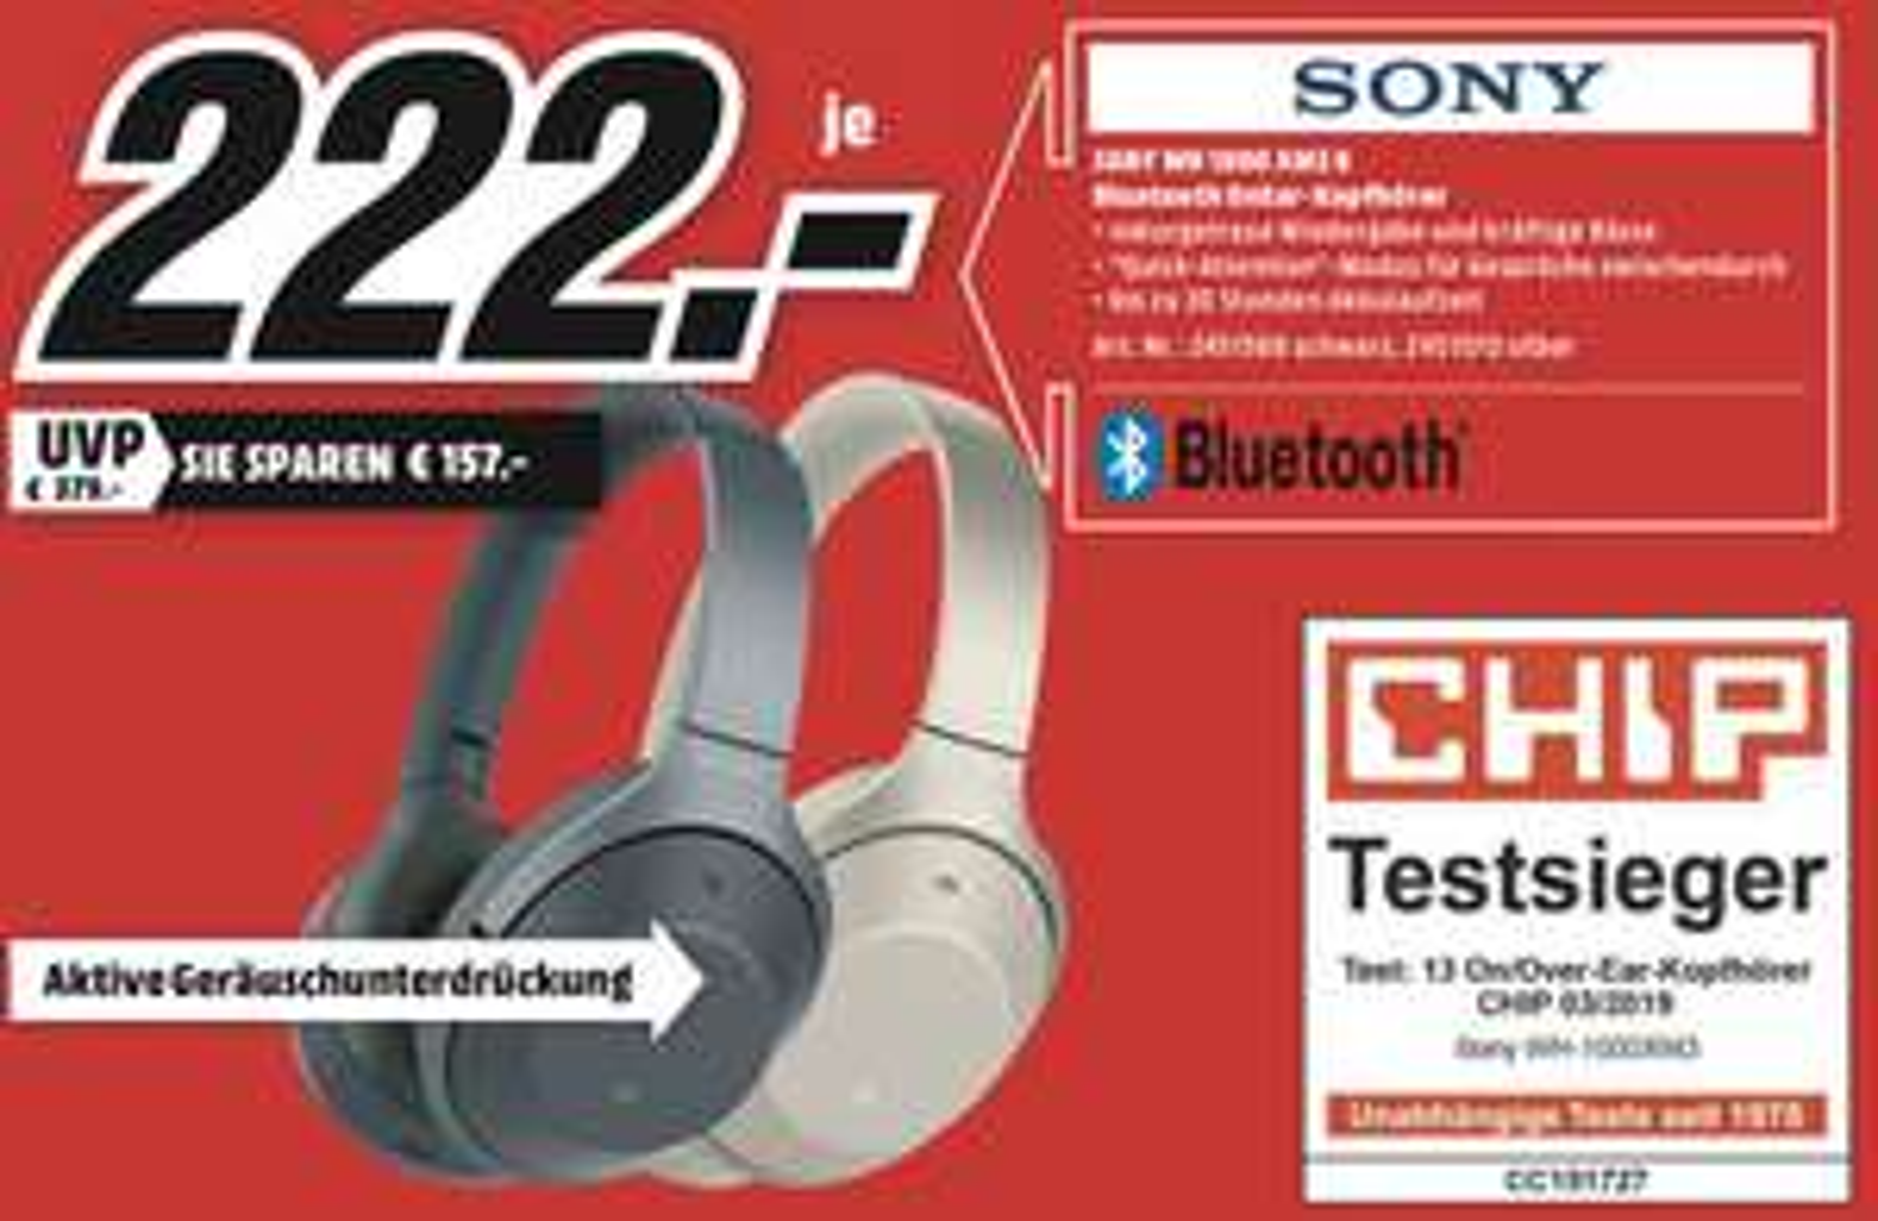 Lokal MediaMarkt Kempten: Sony WH-1000XM3 für 222€ - Kingston HyperX Cloud II für 57€ - Dyson V11 Absolute für 555€ usw.